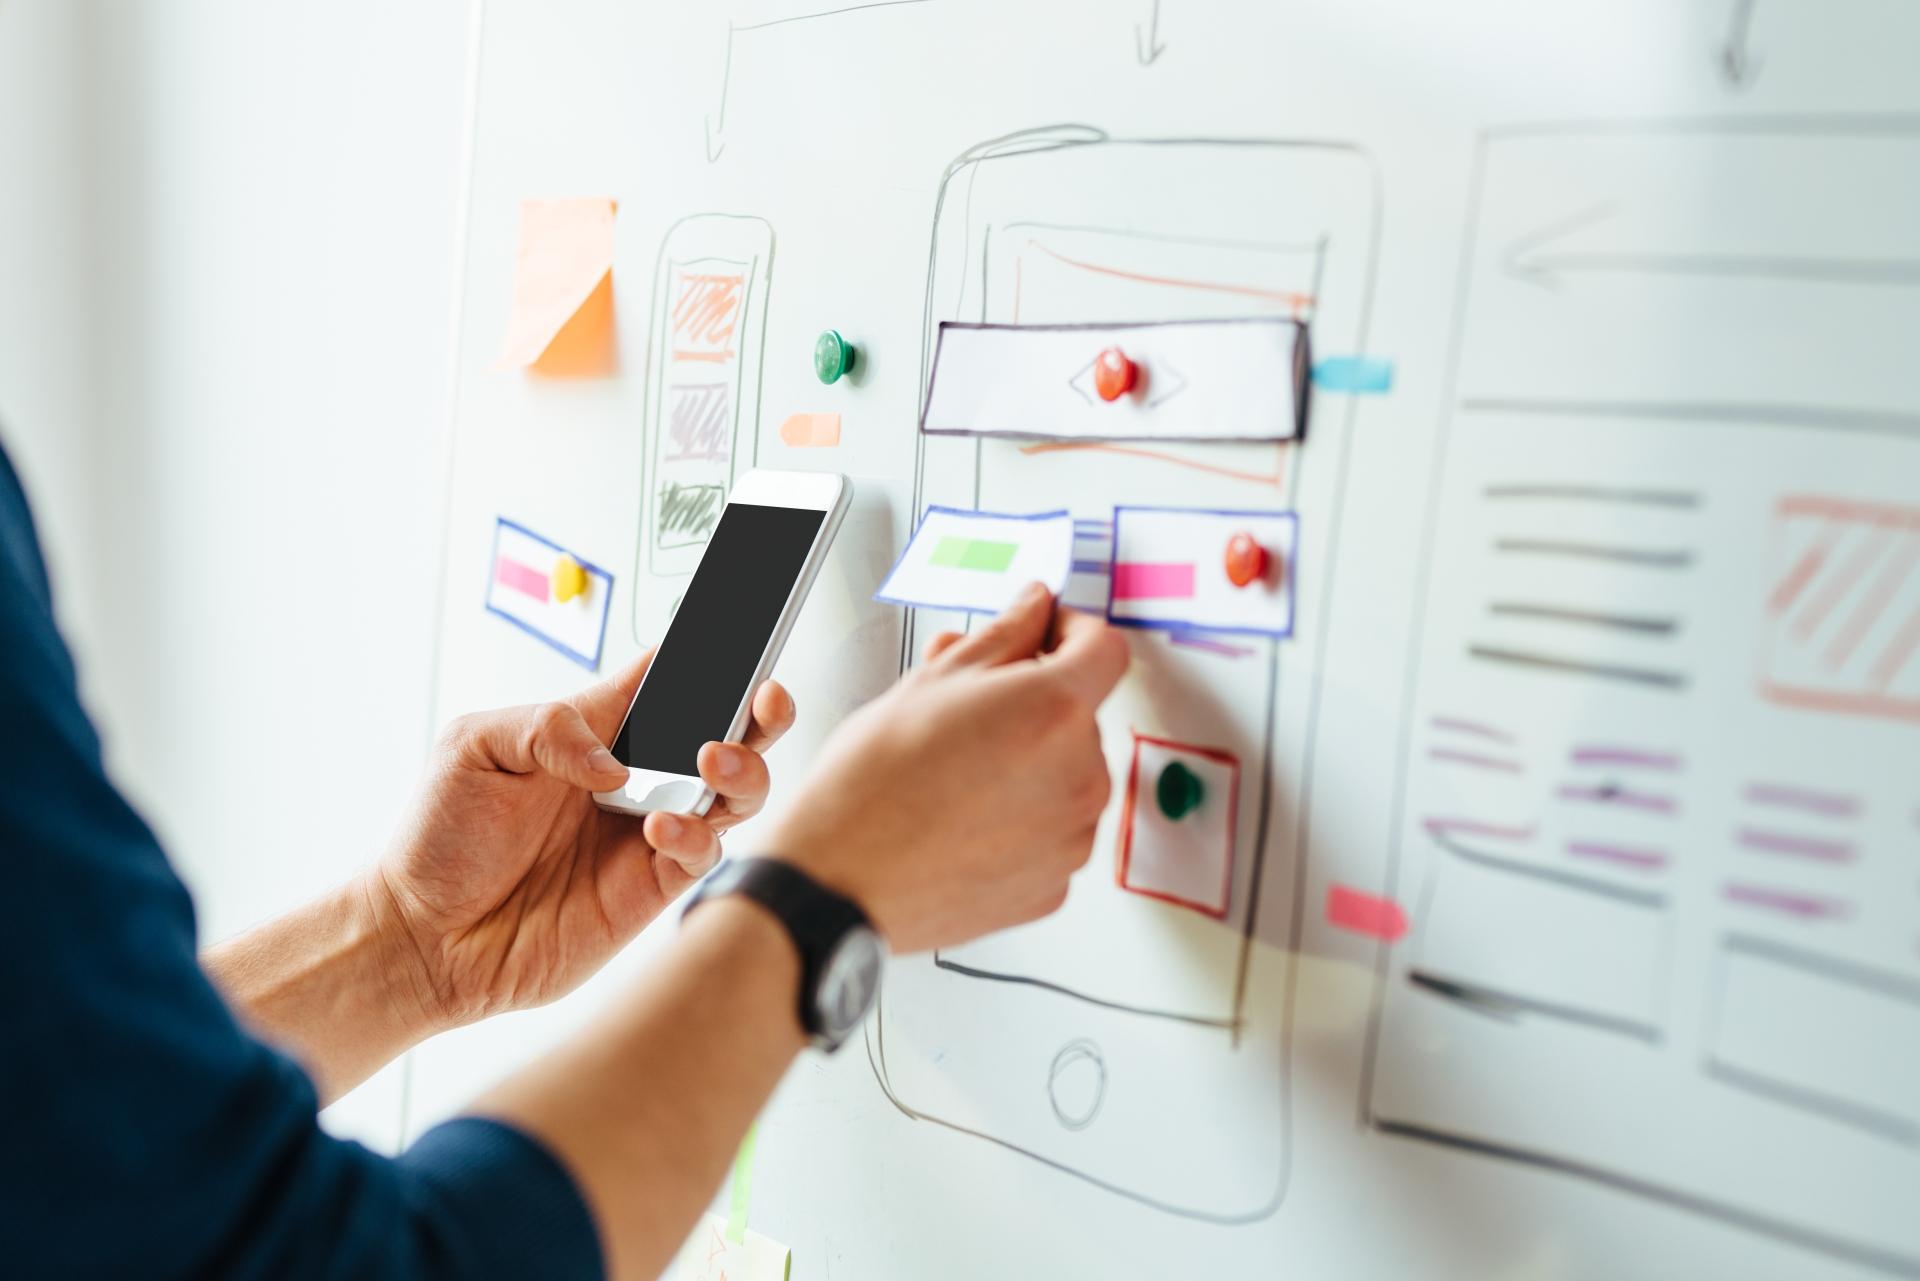 Why Flutter should be your next mobile development framework